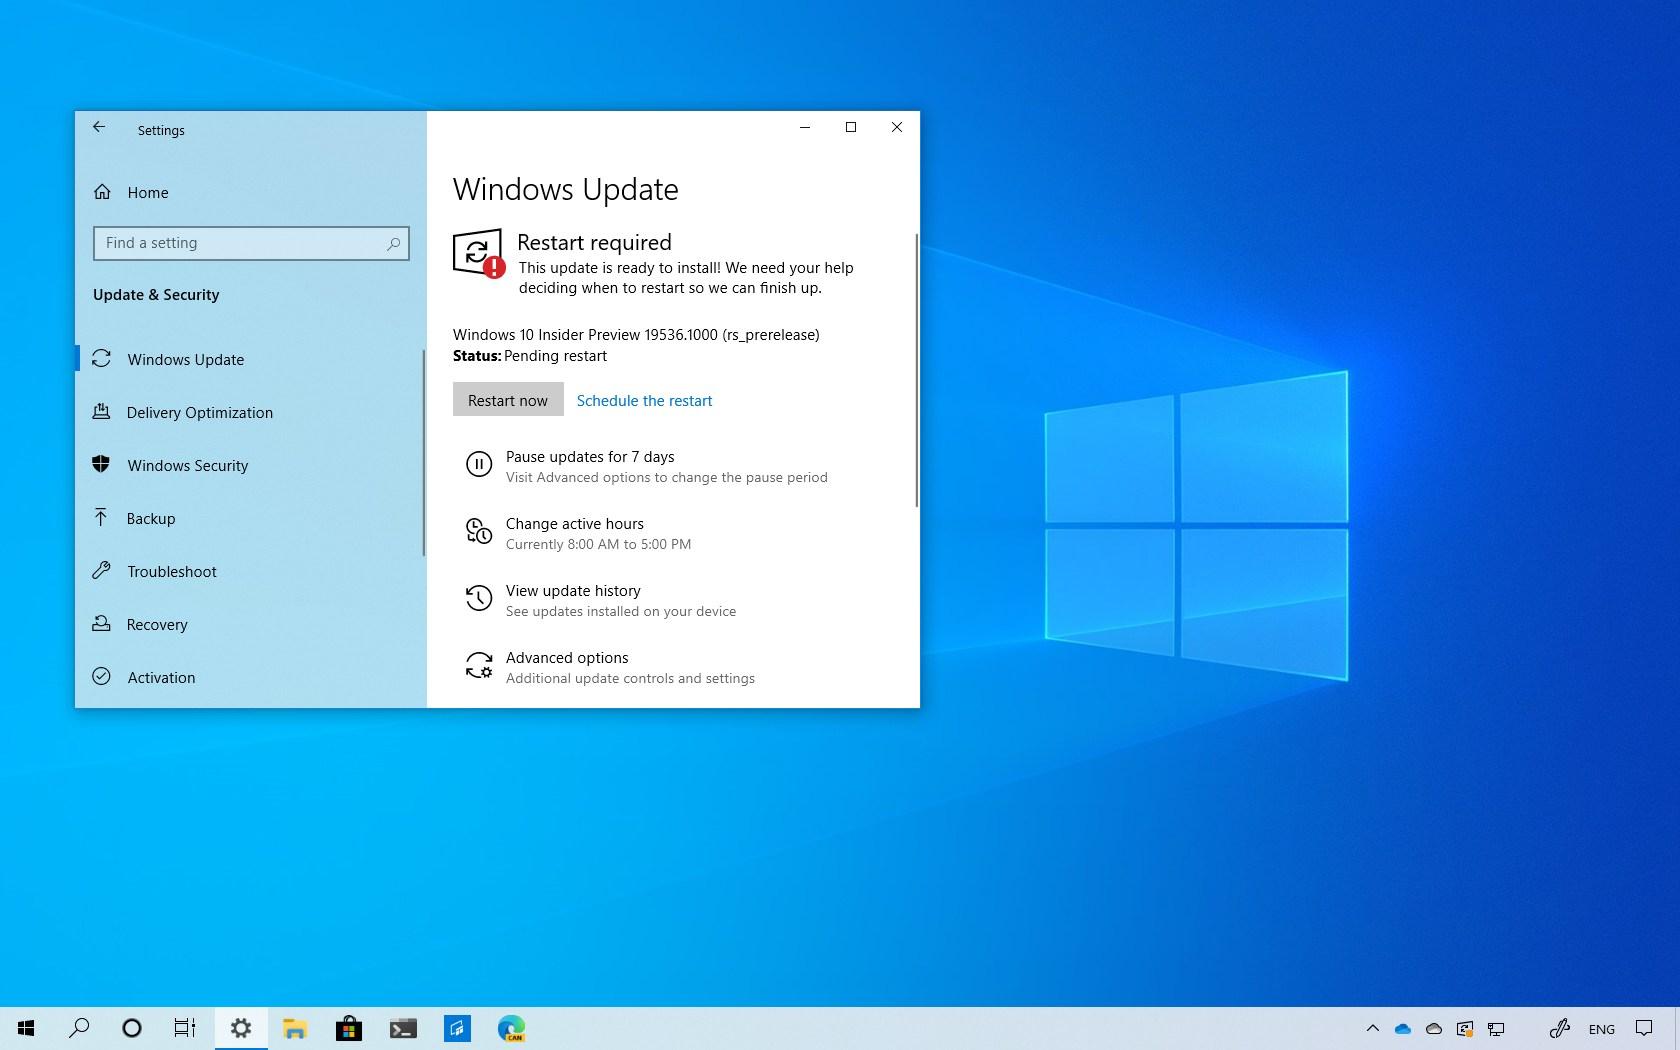 Windows 10 build 19536 download